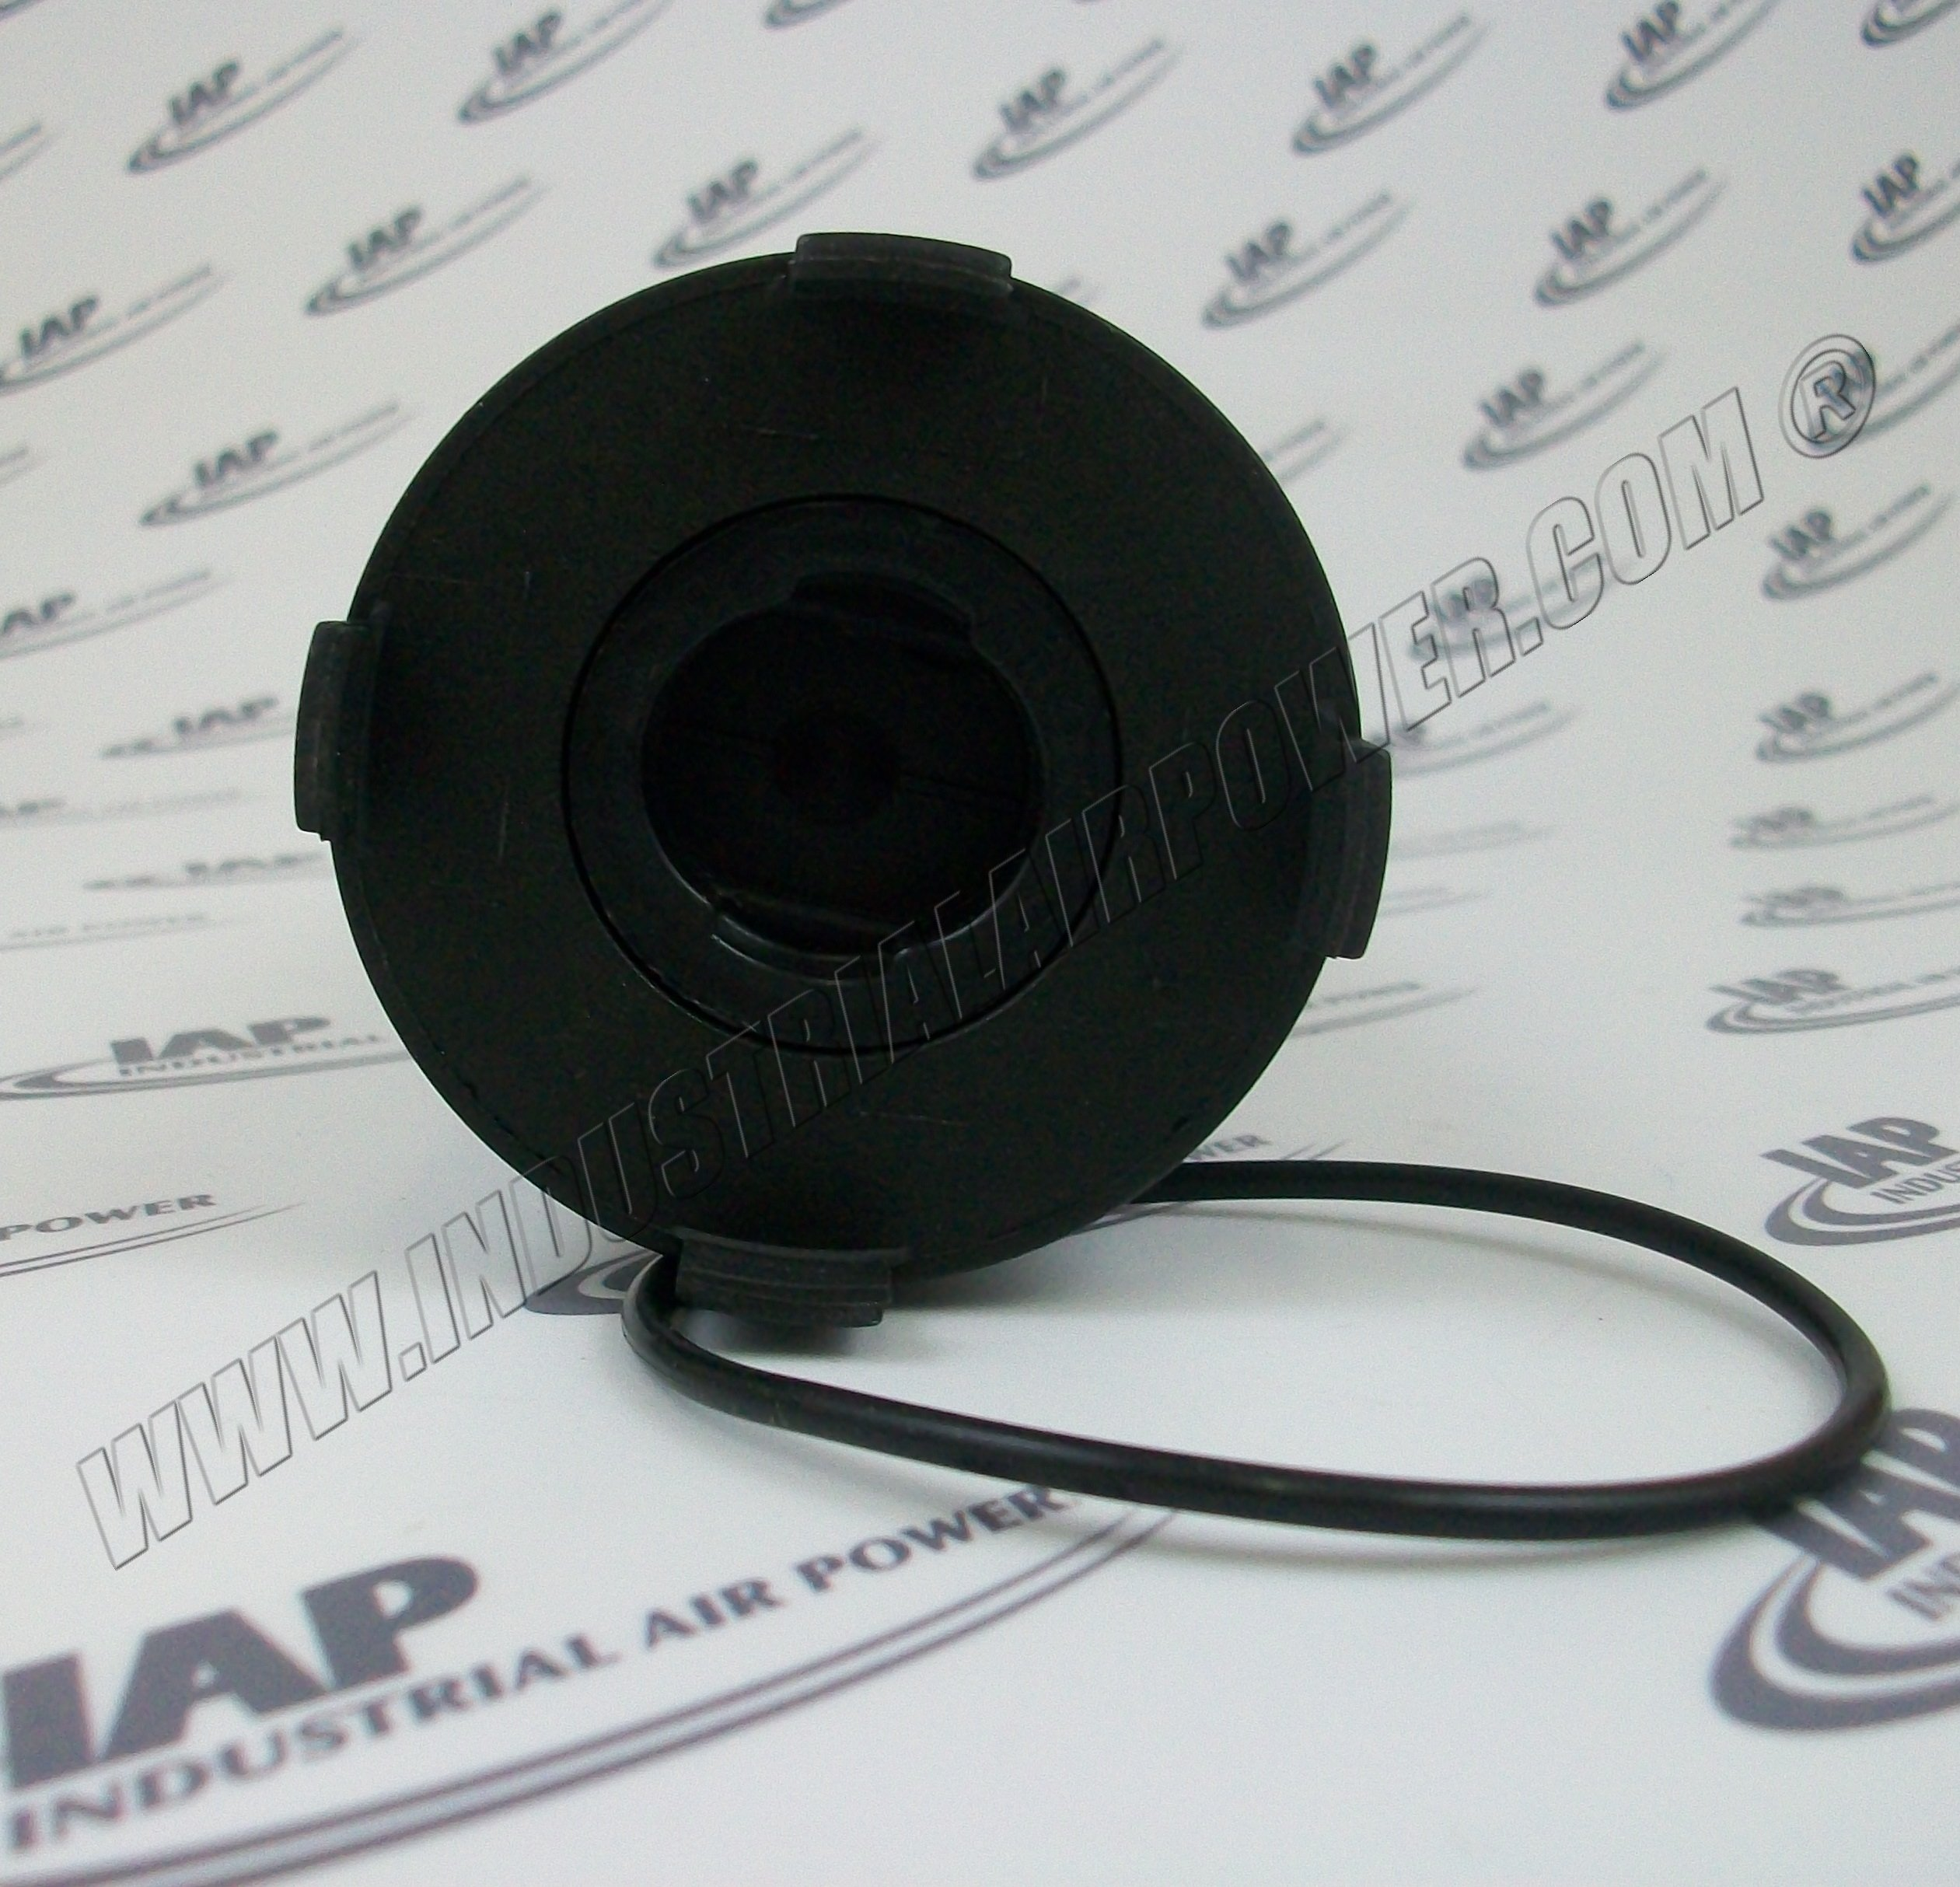 2118342 Oil Filter Element Designed for use with Gardner Denver Compressors by Industrial Air Power